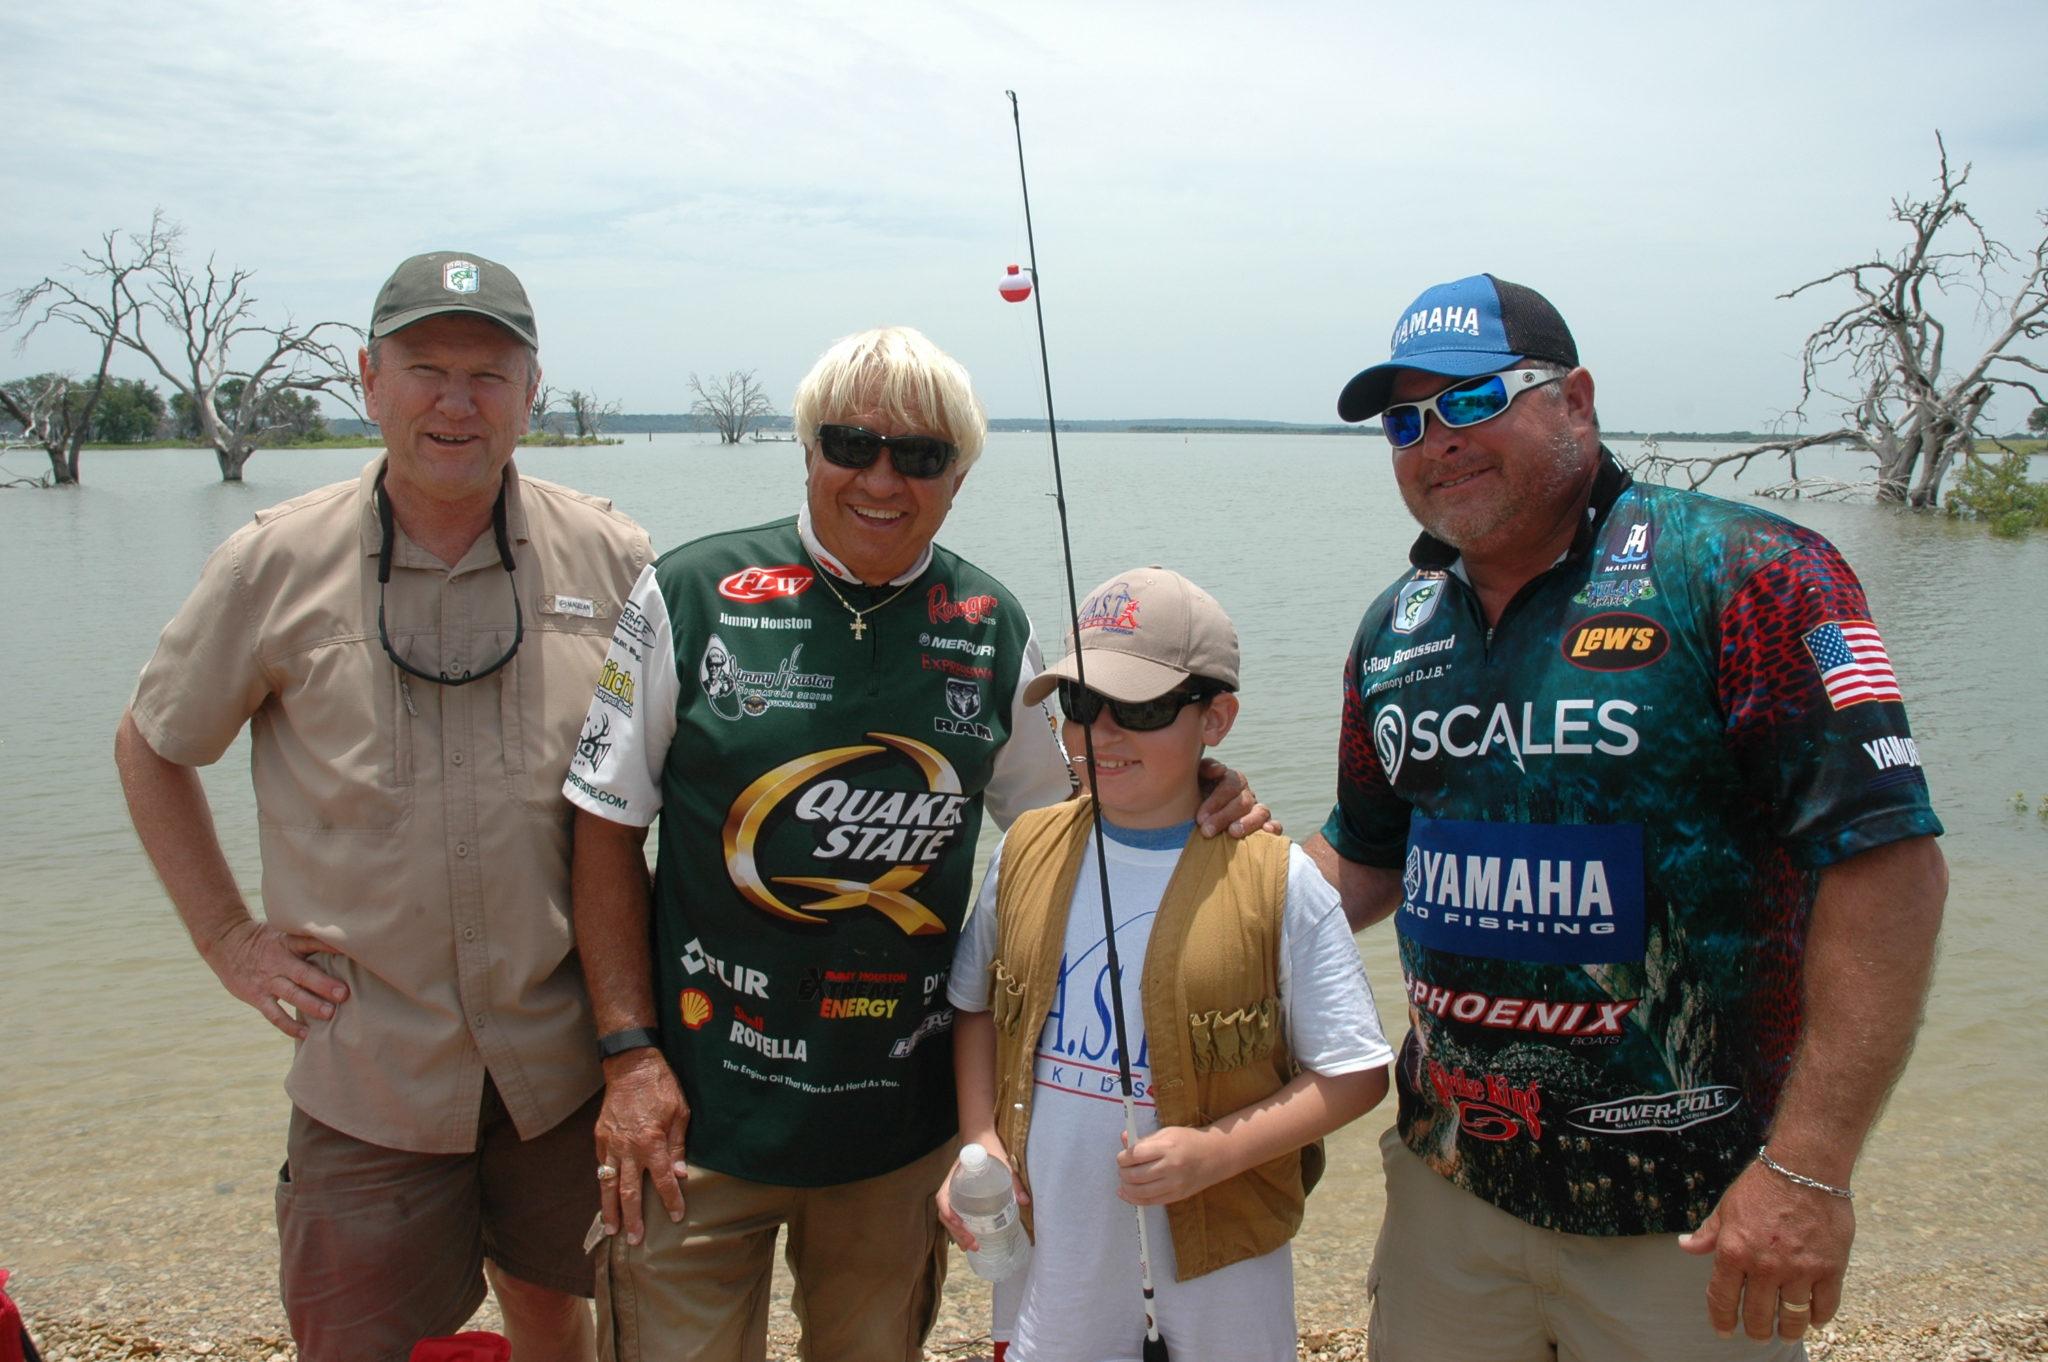 Haley's Heroes C.A.S.T. for Kids Lake Waco